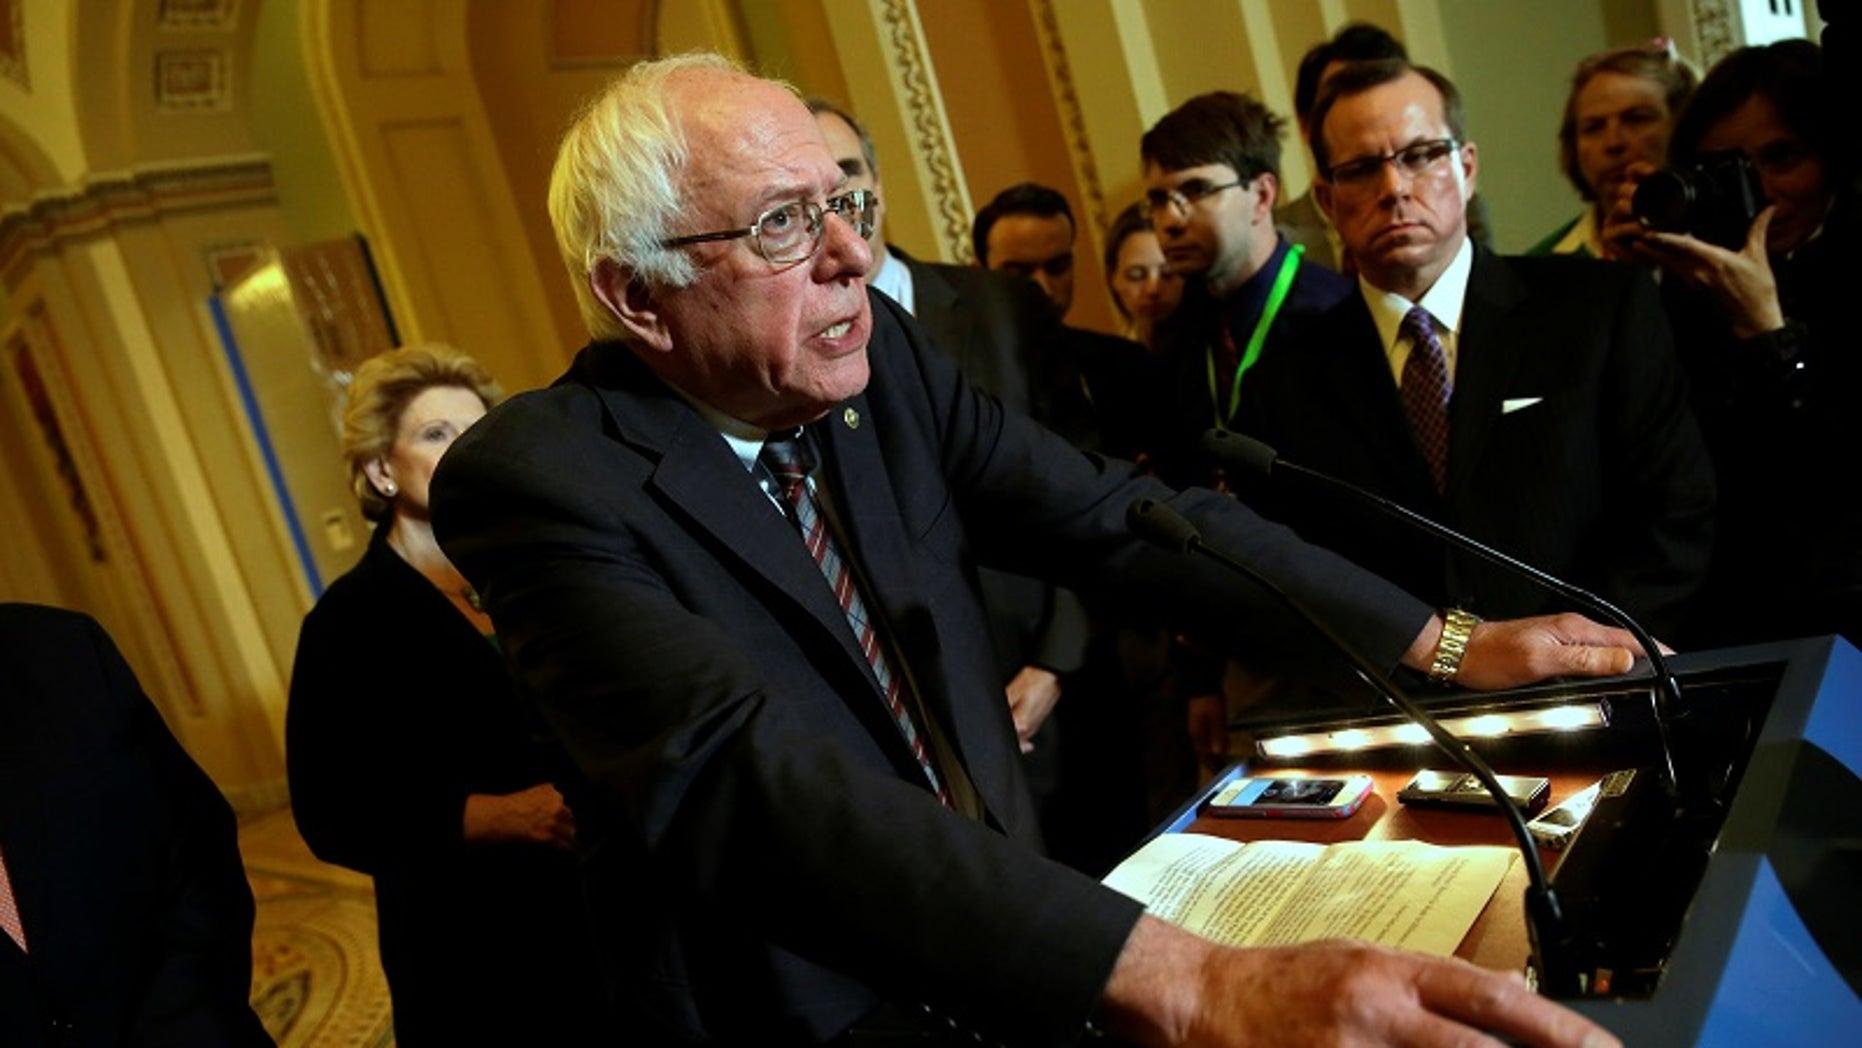 FILE -- Senator Bernie Sanders (D-VT) talks to the media on the president's FY2018 budget proposal on Capitol Hill in Washington, U.S., May 23, 2017.